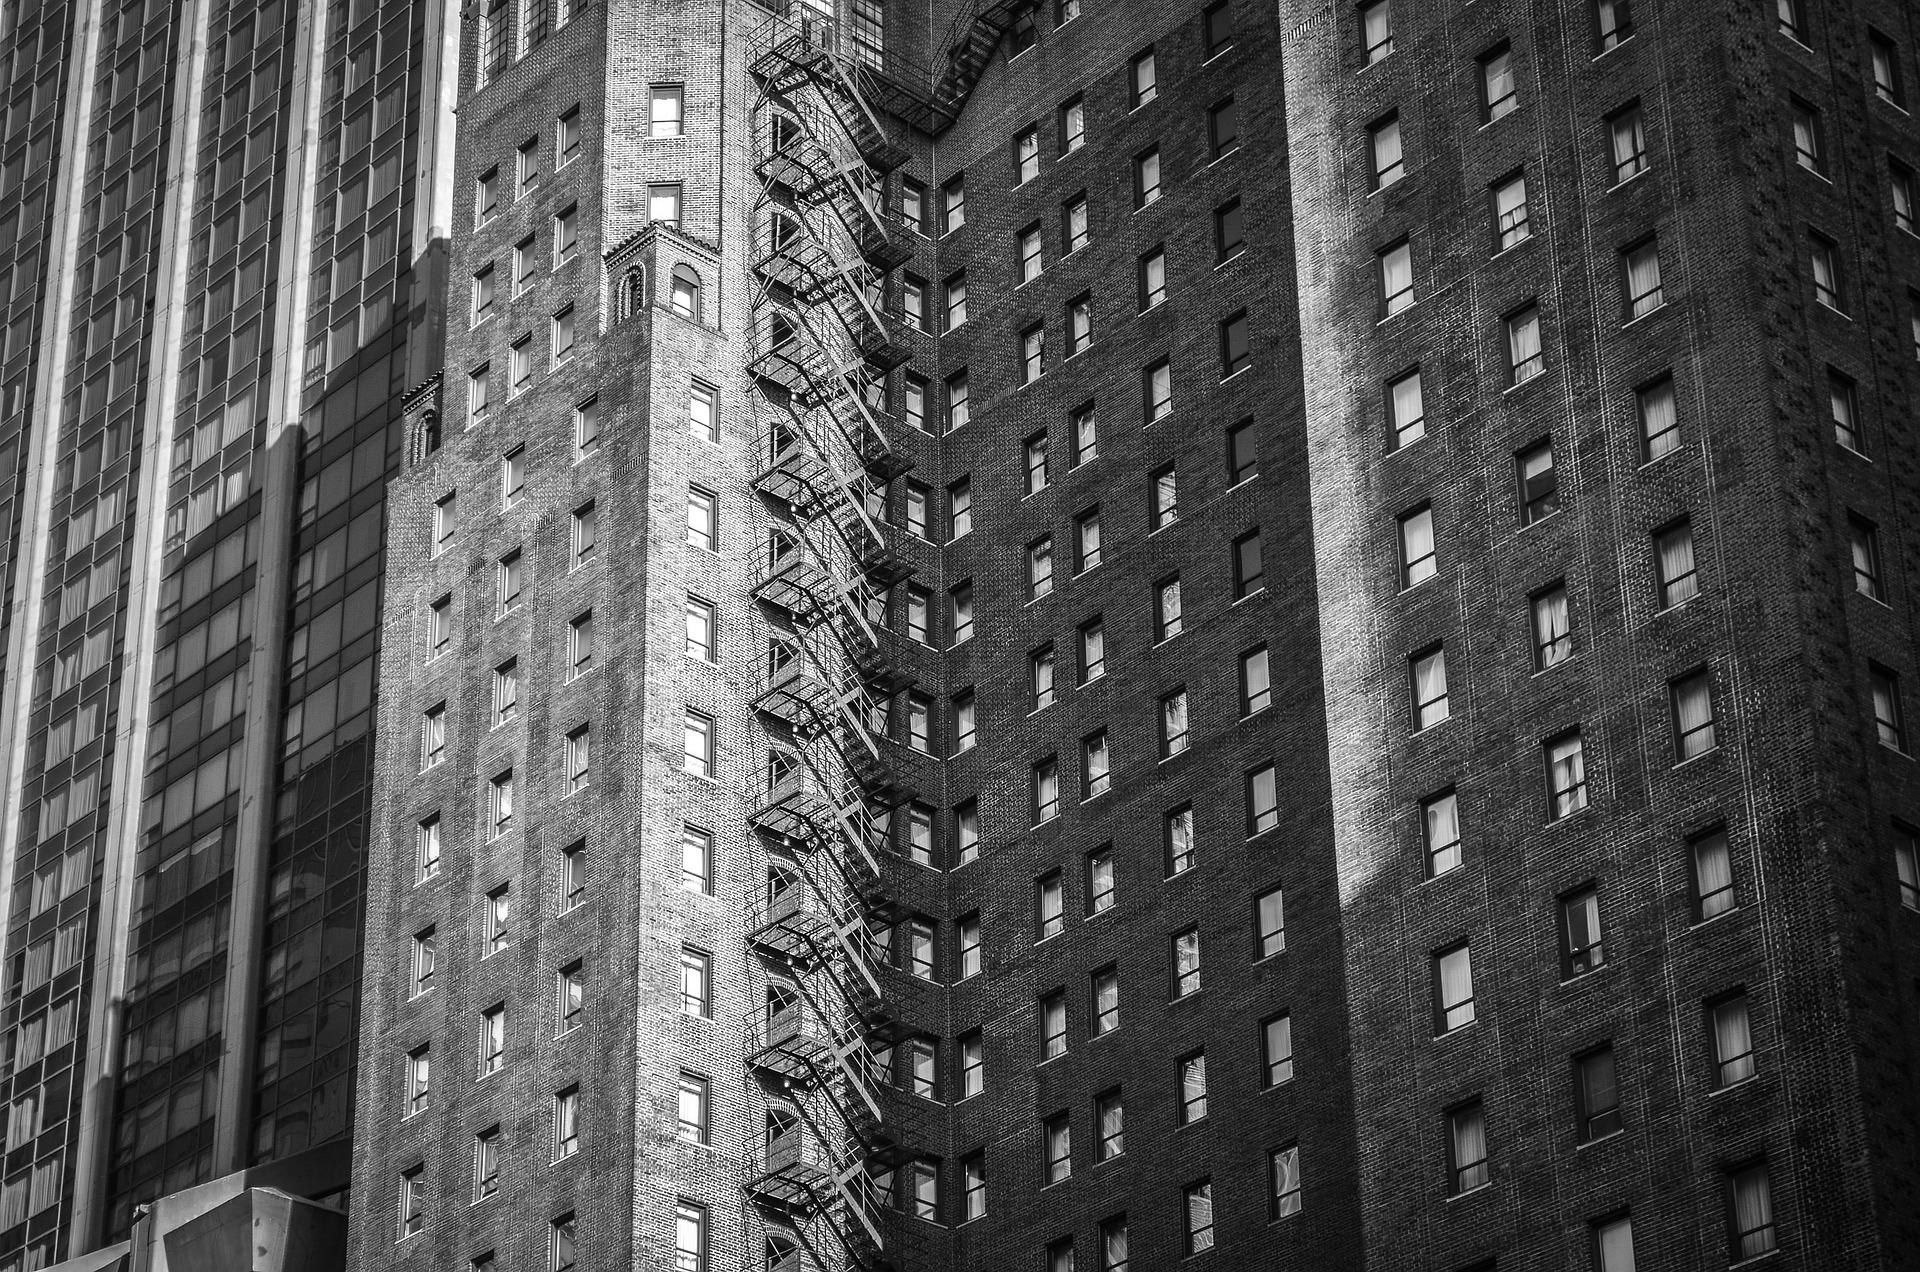 building-690330_1920.jpg